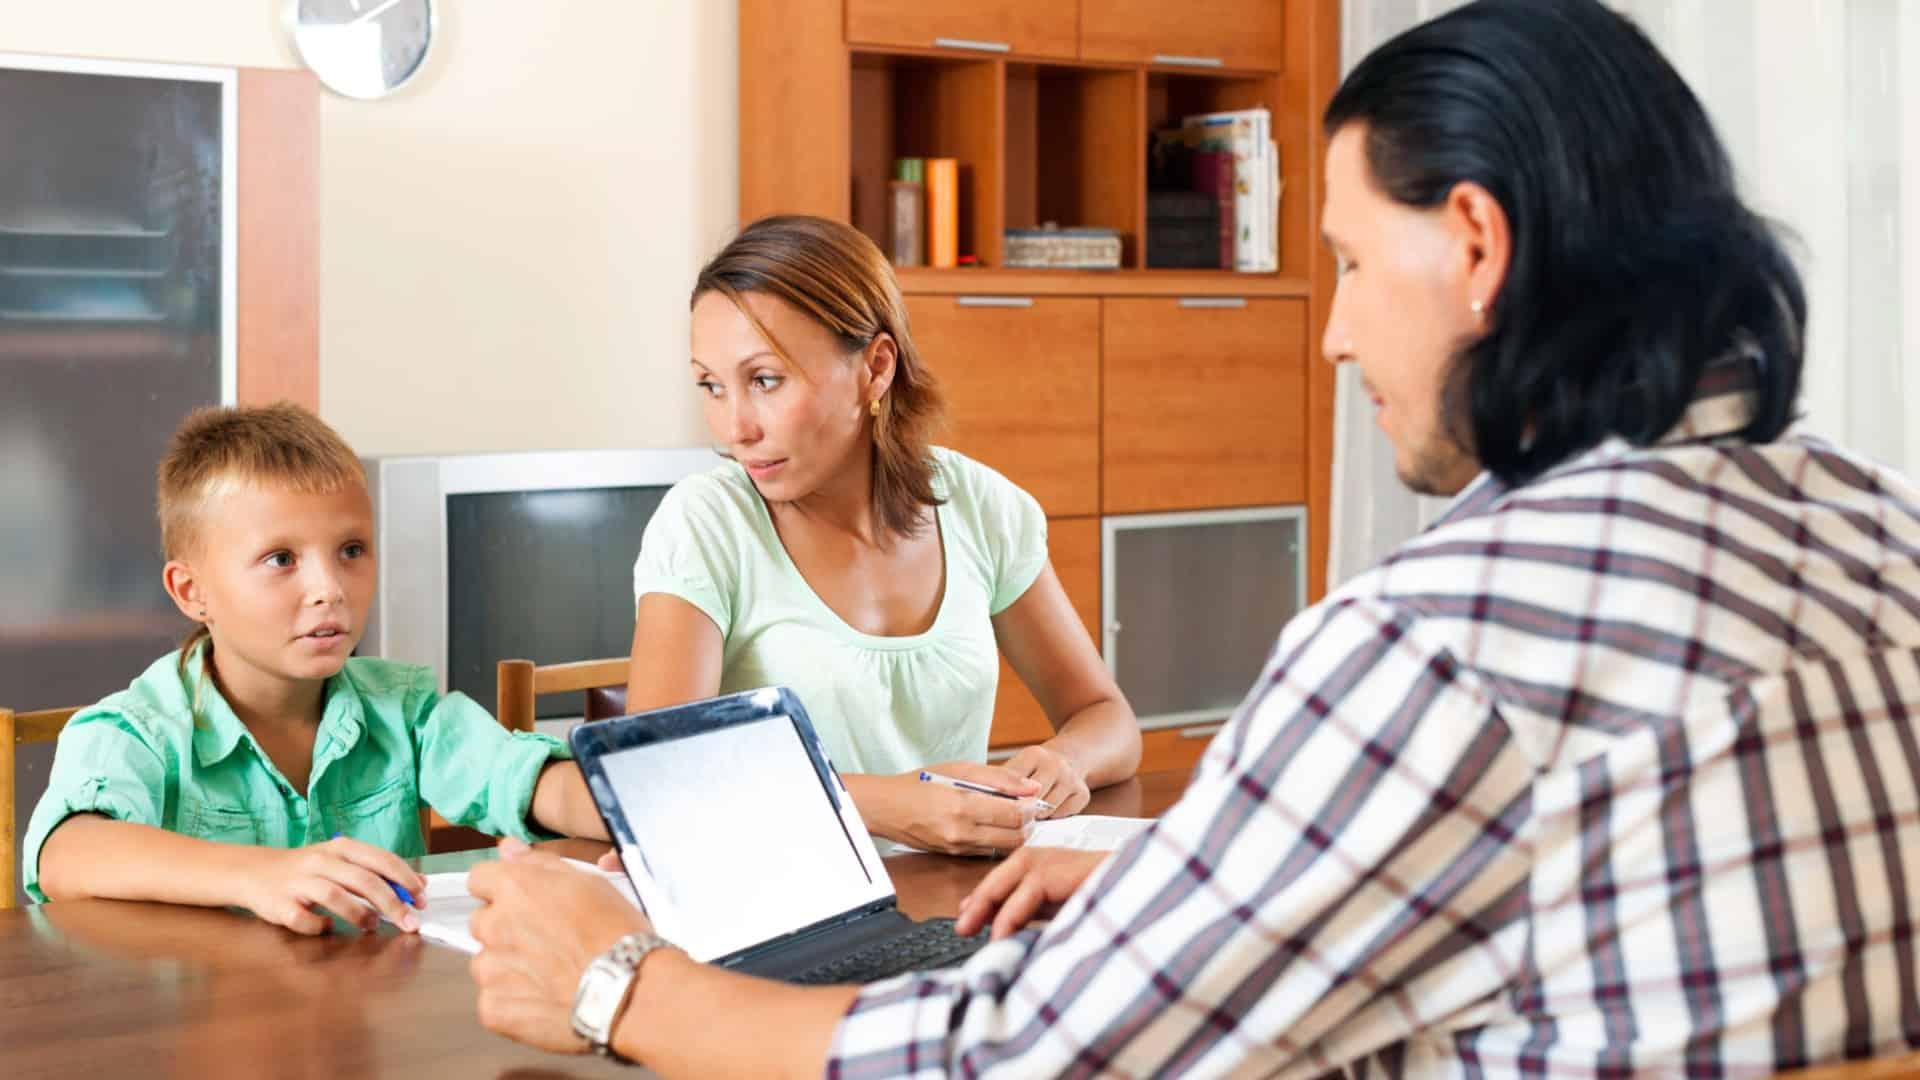 Social Worker Job Description | Social Worker Job Description Qualifications And Outlook